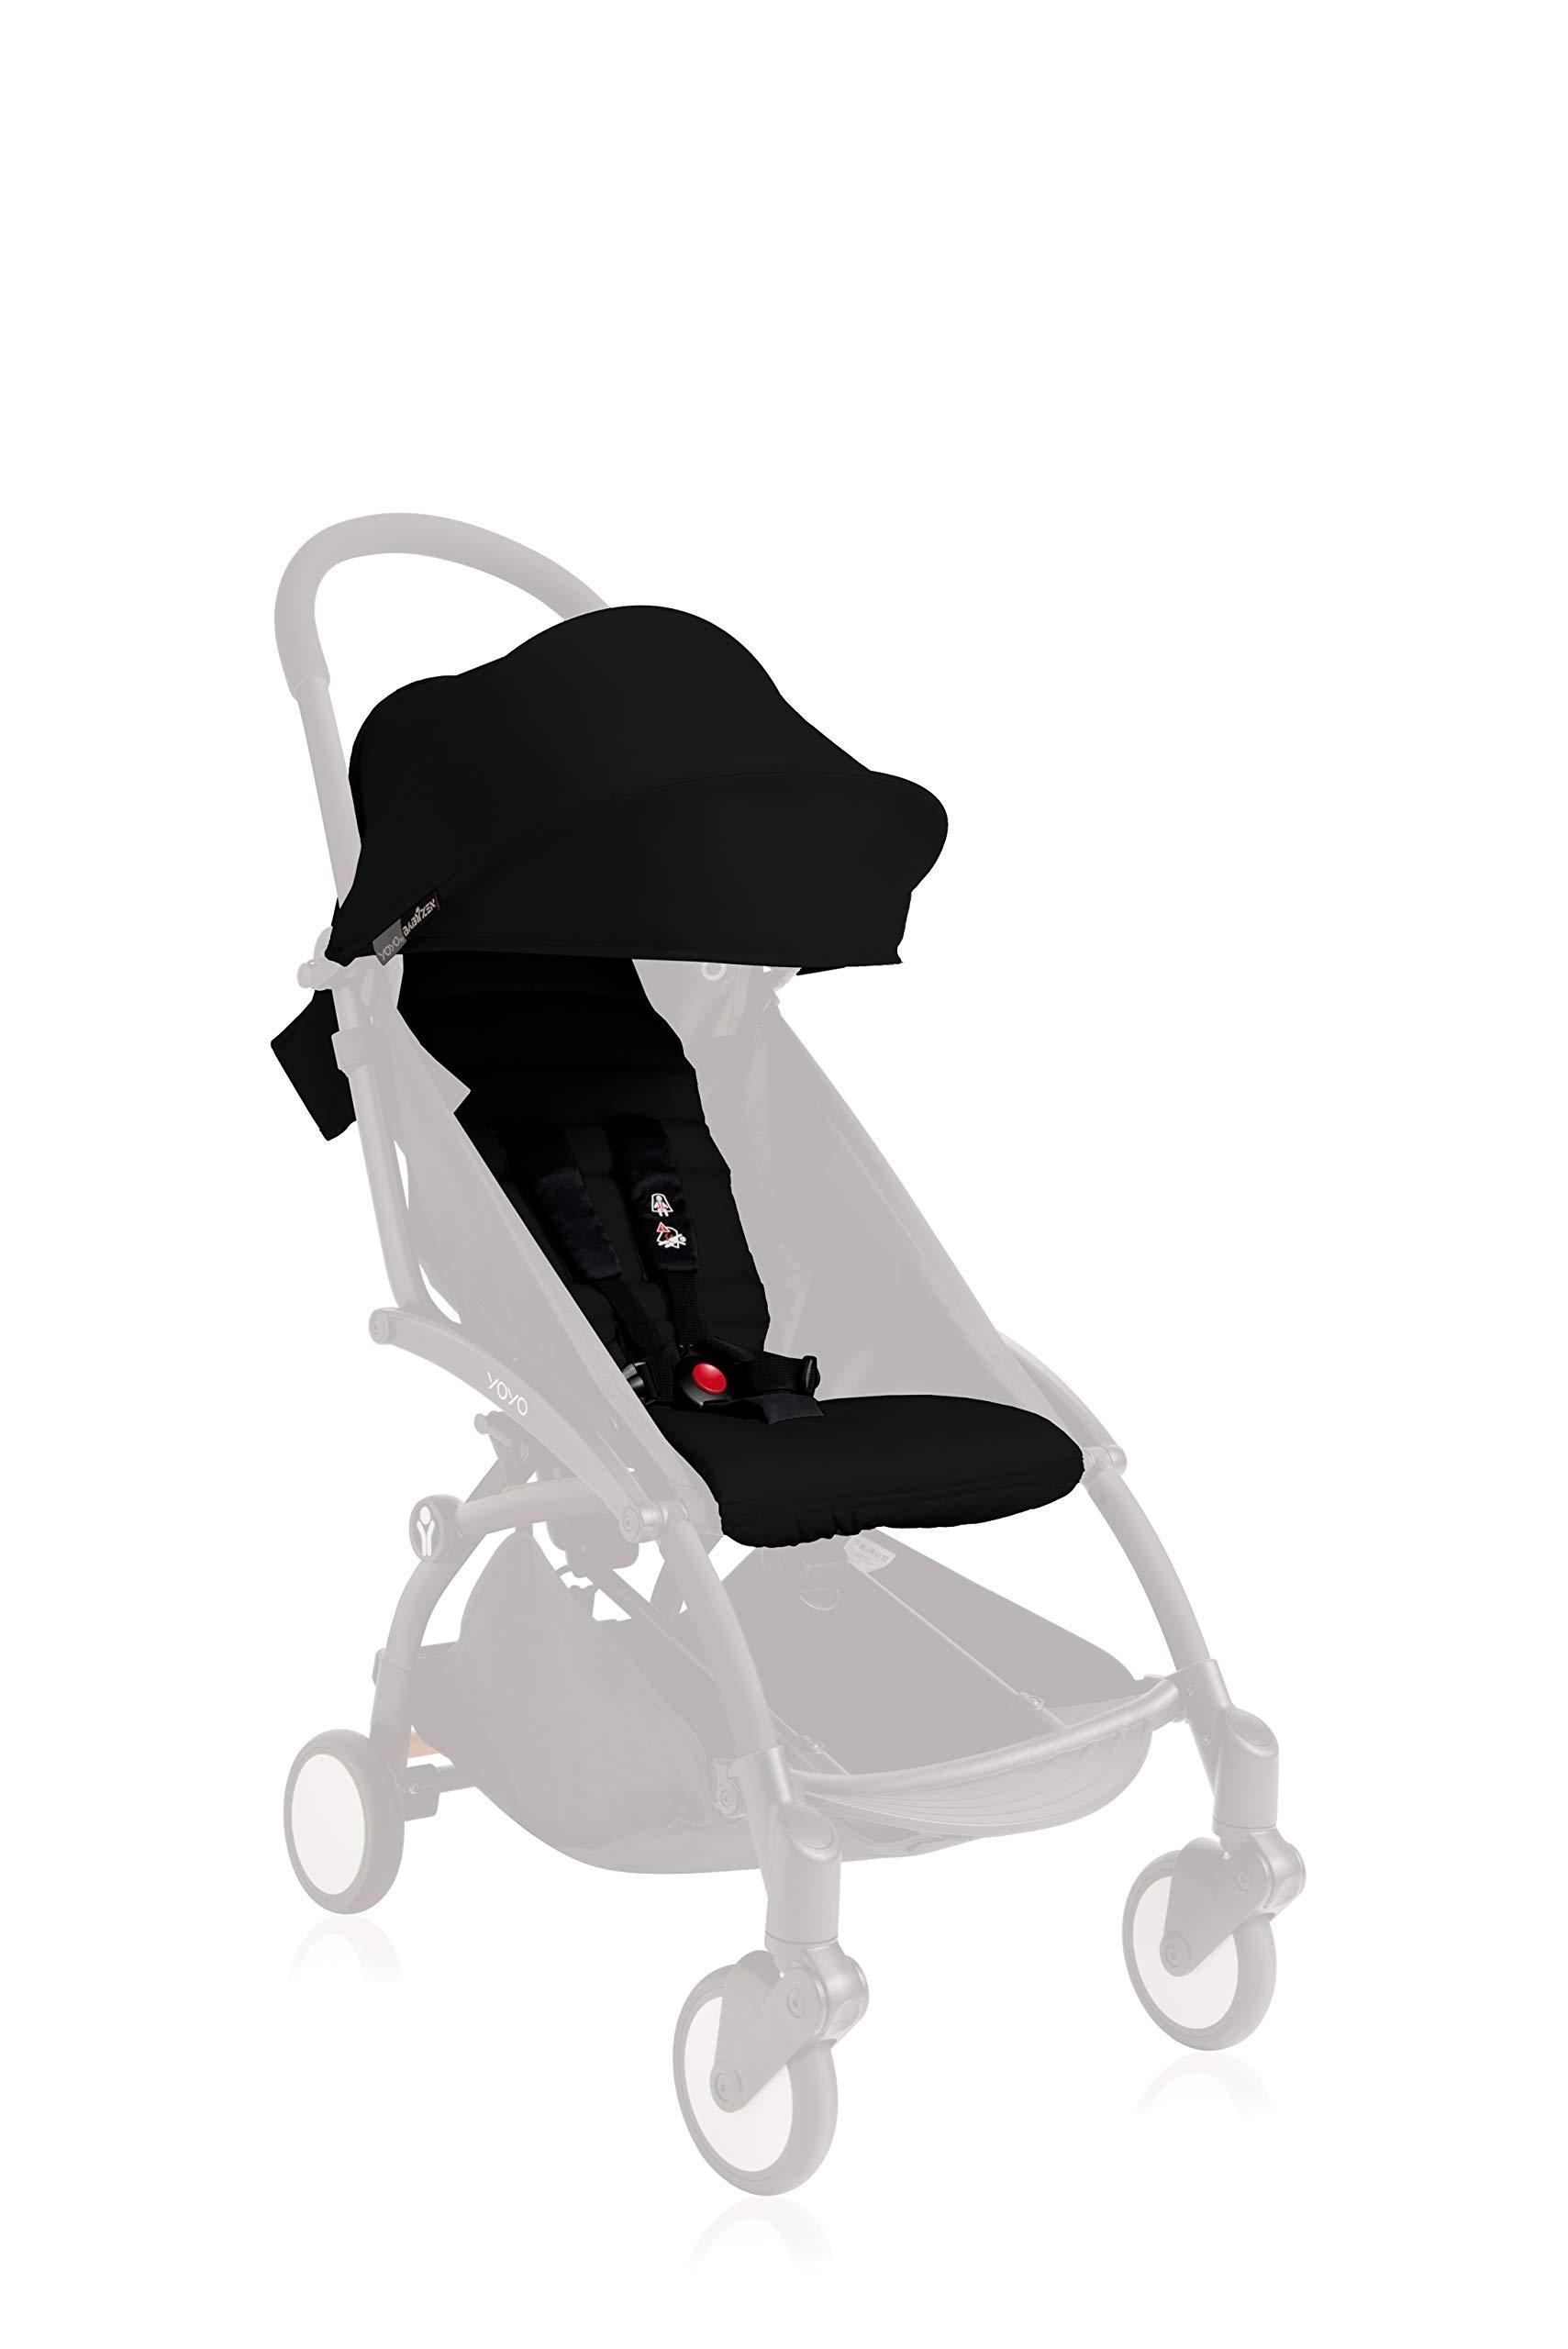 Babyzen Yoyo+ Pack 6+ Black BabyZEN BabyZen YOYO 6+ Color Pack - Black by Baby Zen One Size 1